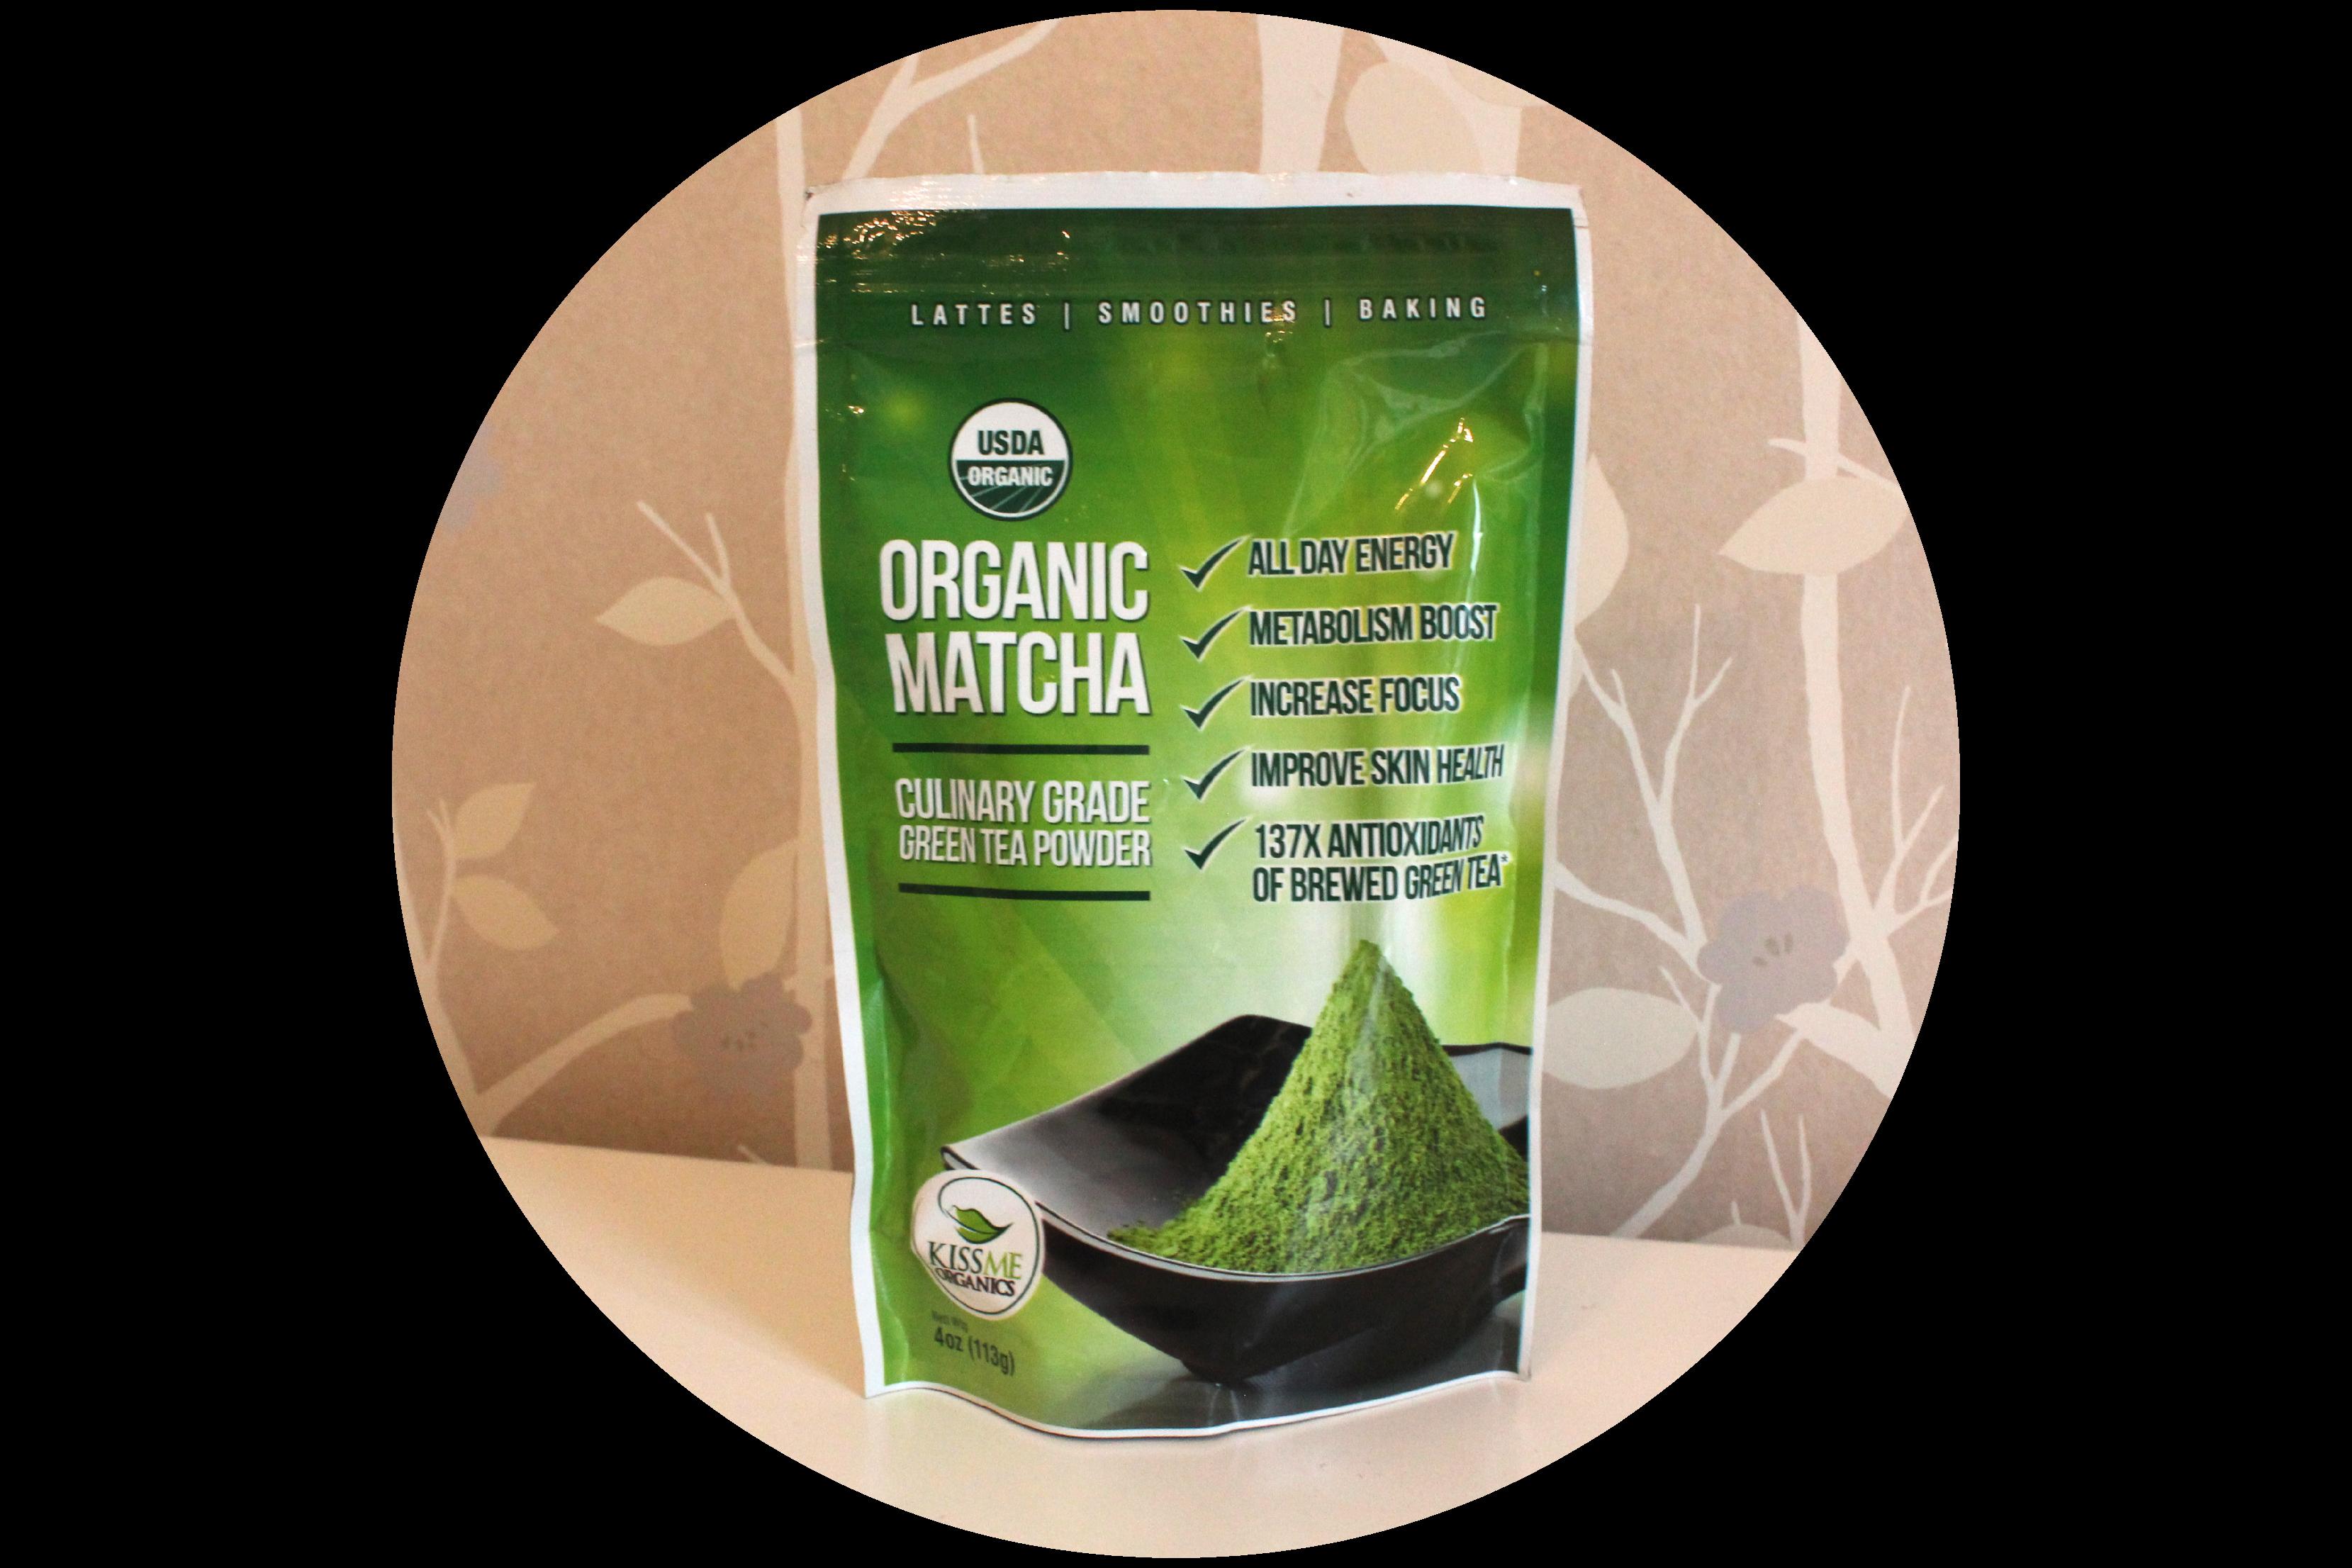 Matcha Organic Green Tea Powder Review